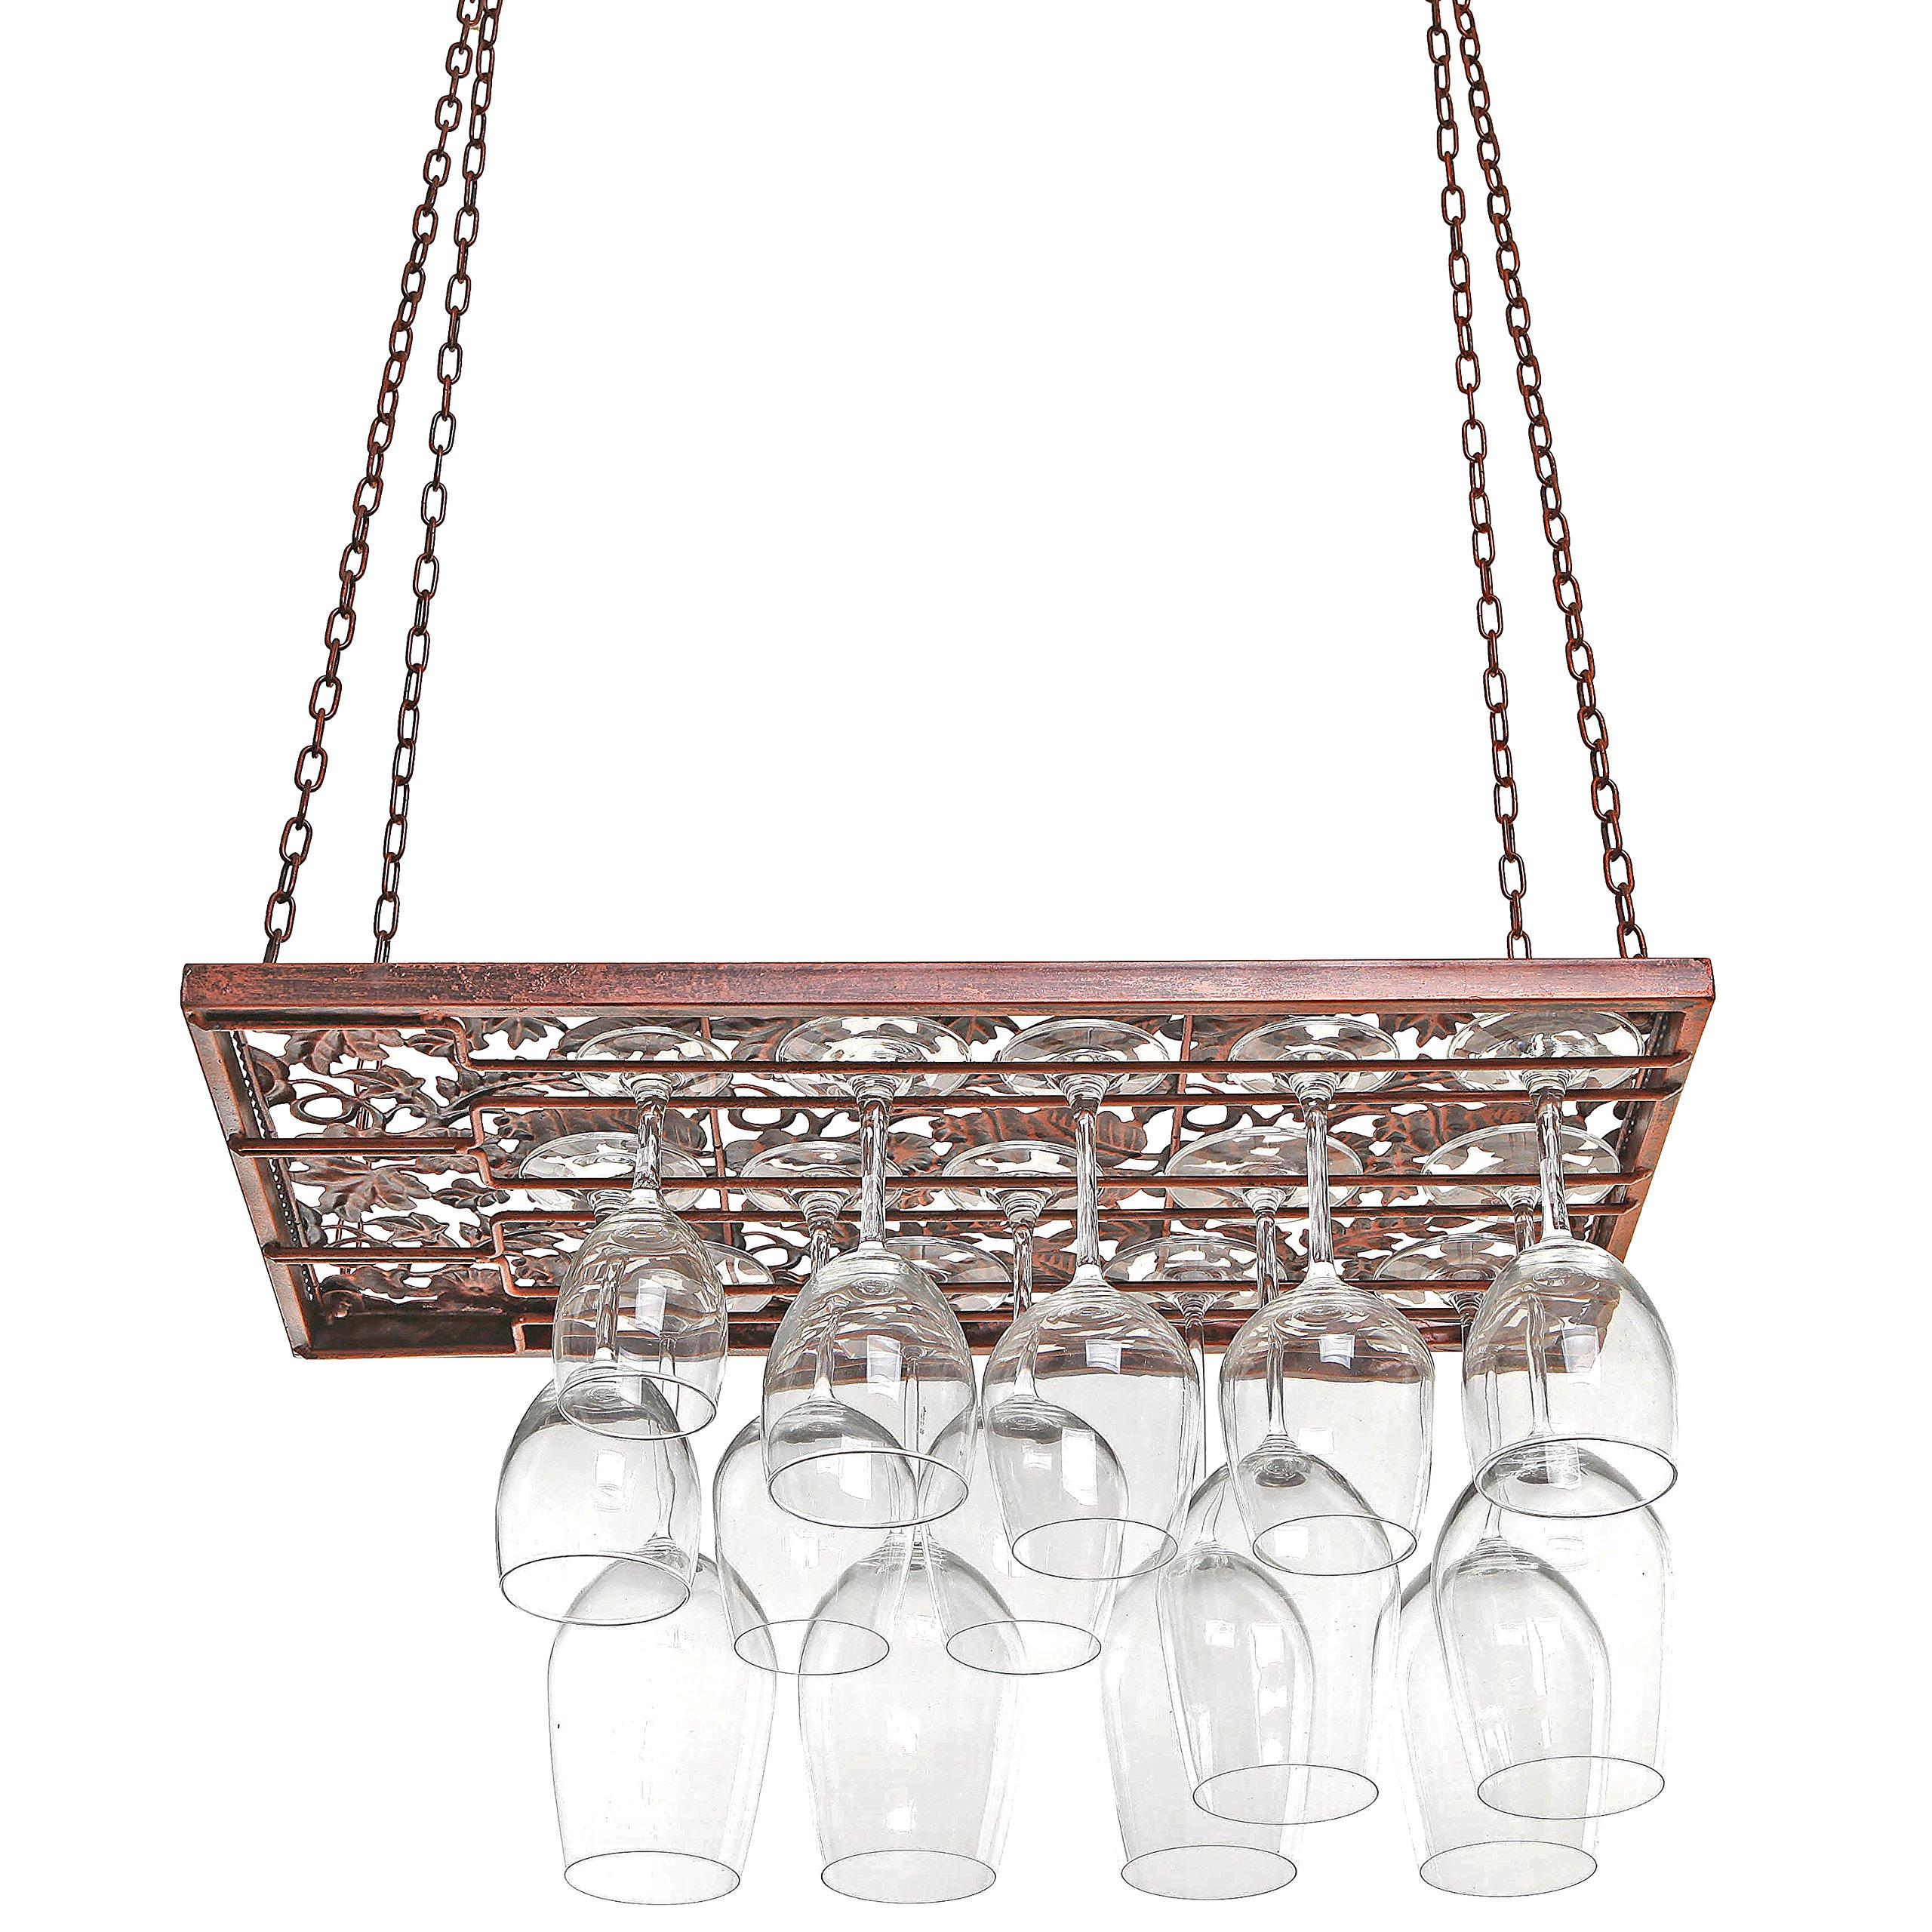 Vineyard Country Rustic Bronze Metal Ceiling Mounted Hanging Stemware Wine Glass Hanger Organizer Rack by MyGift (Image #3)